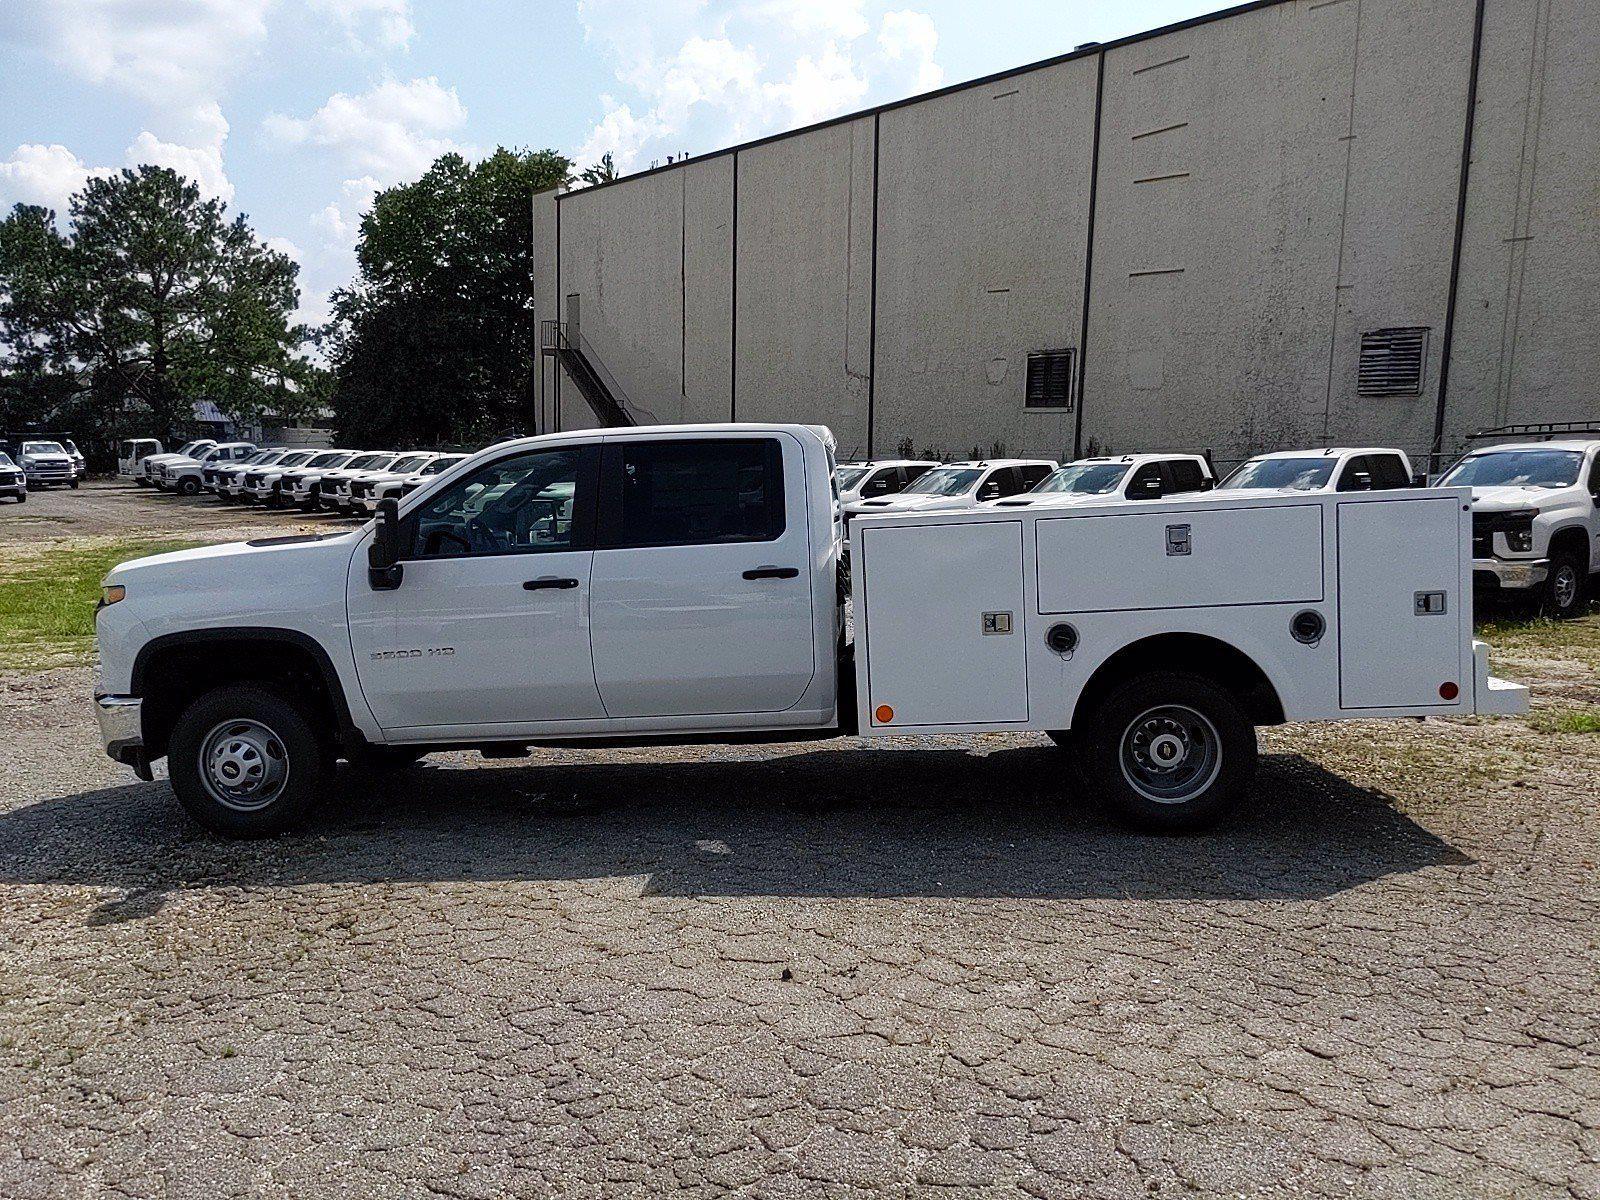 2021 Silverado 3500 Crew Cab 4x2,  Warner Truck Bodies Service Body #351042 - photo 4